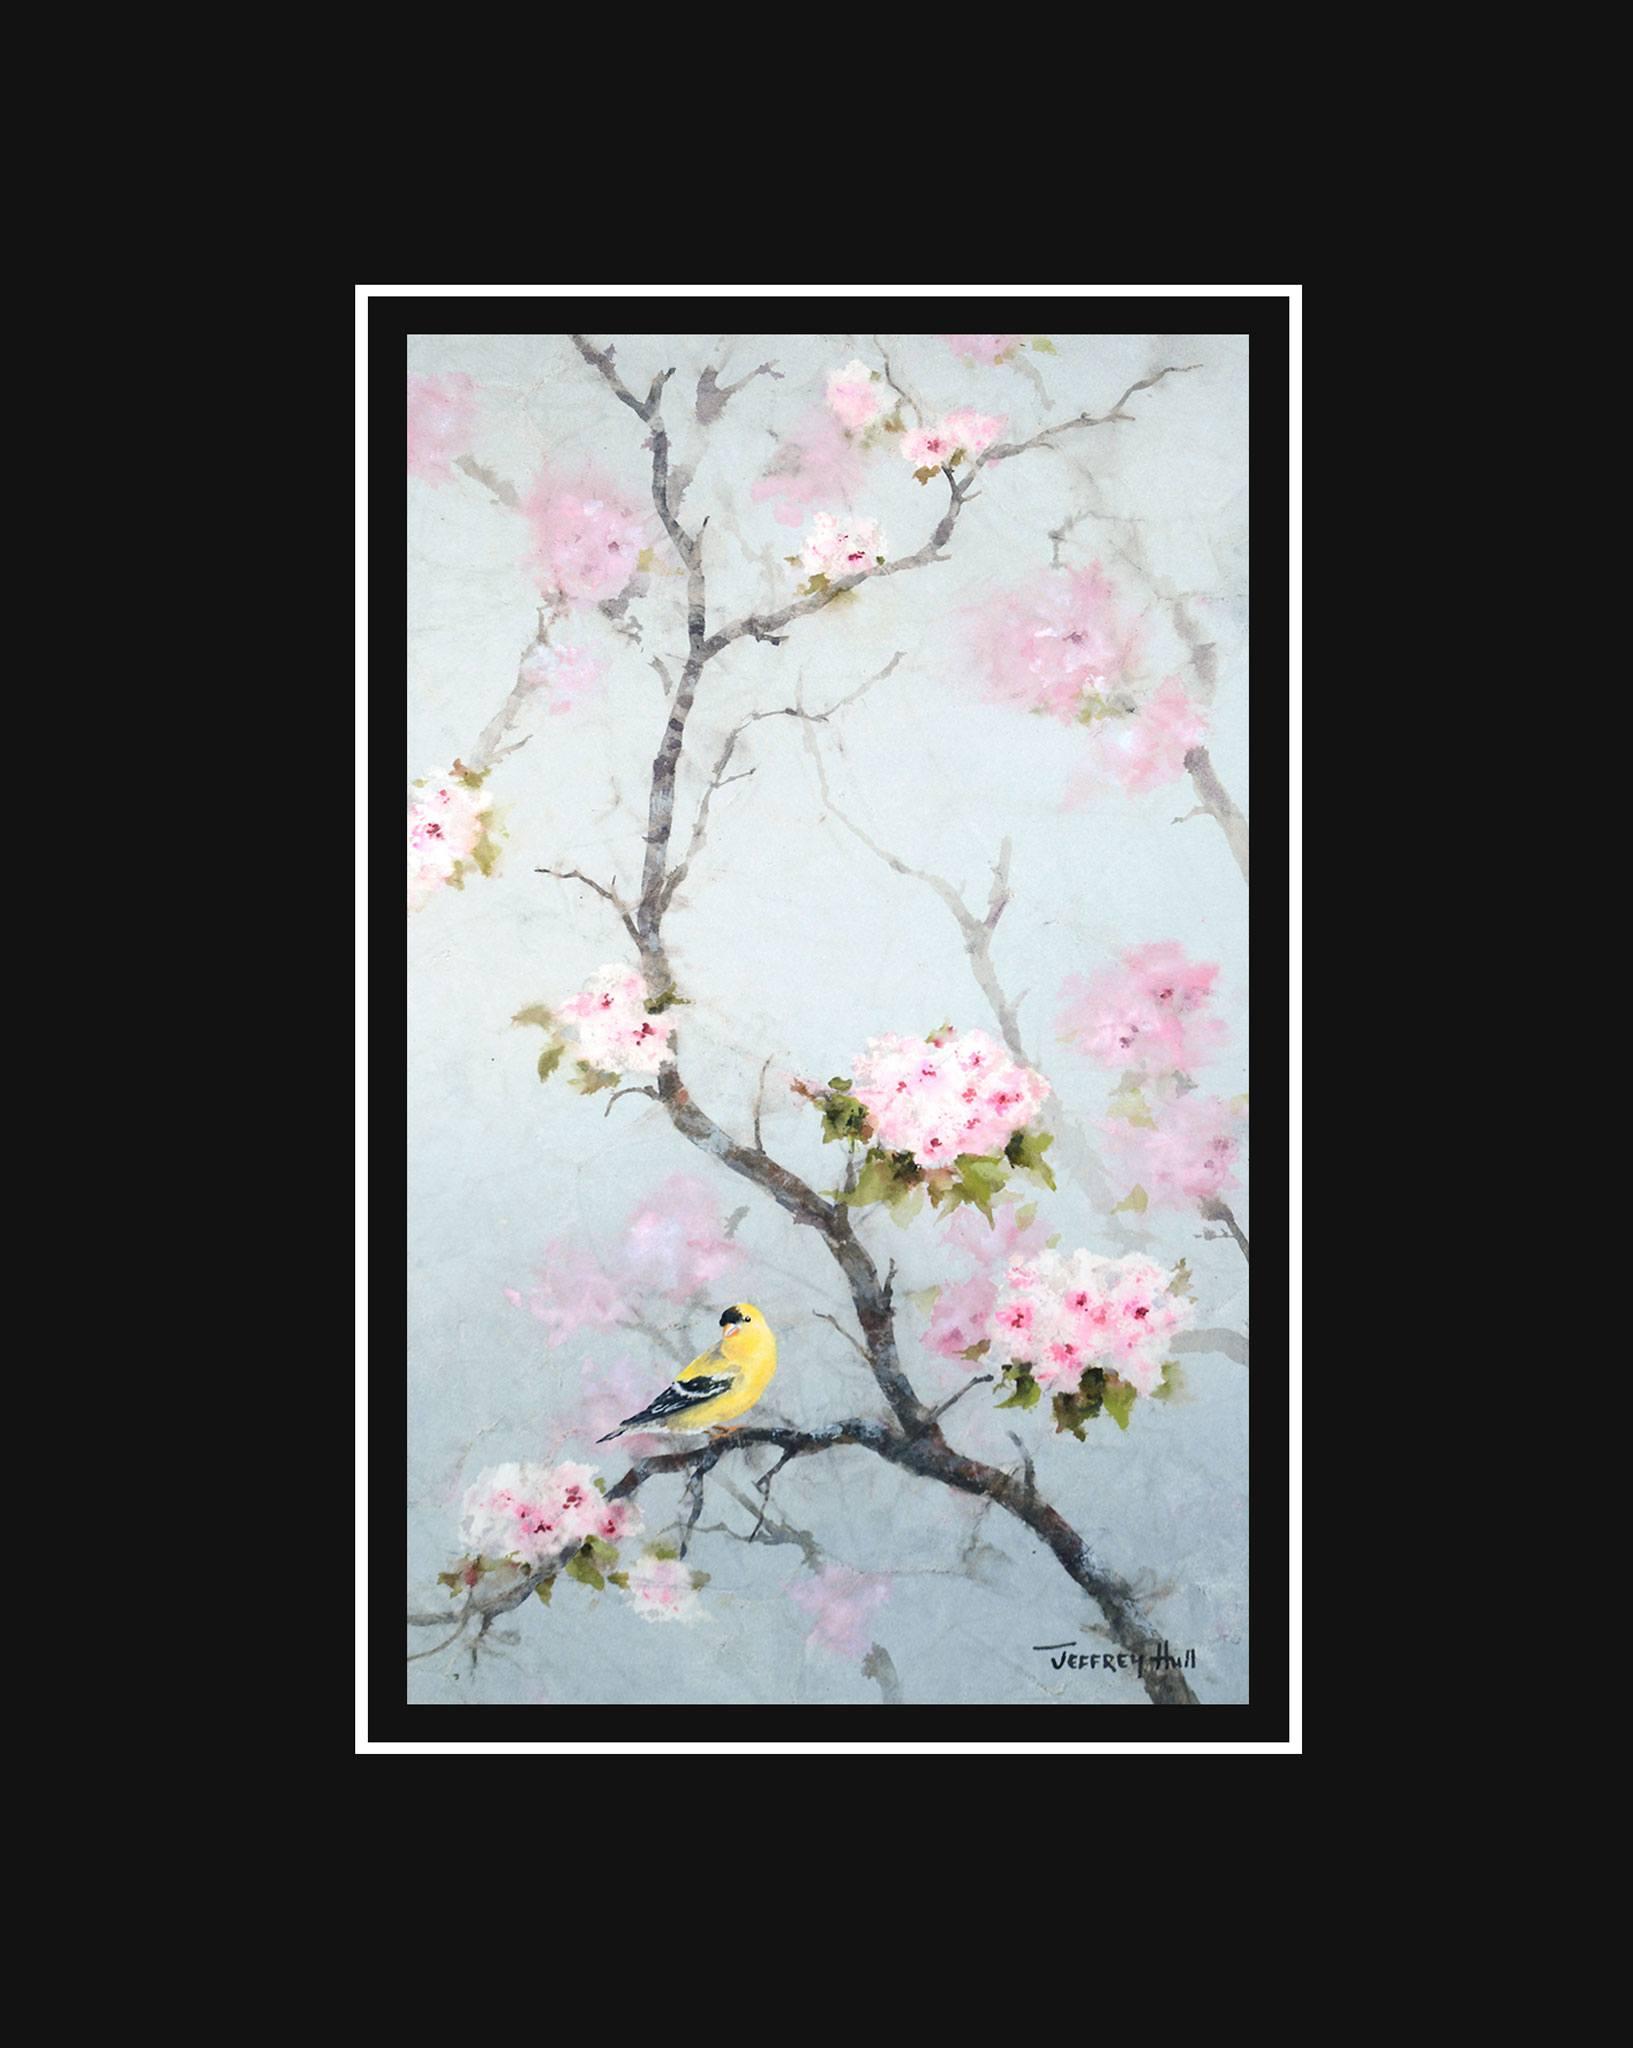 Goldfinch-_-Cherry-Blossoms-Mini-Unframed-Jet-Black-4-Website-2021